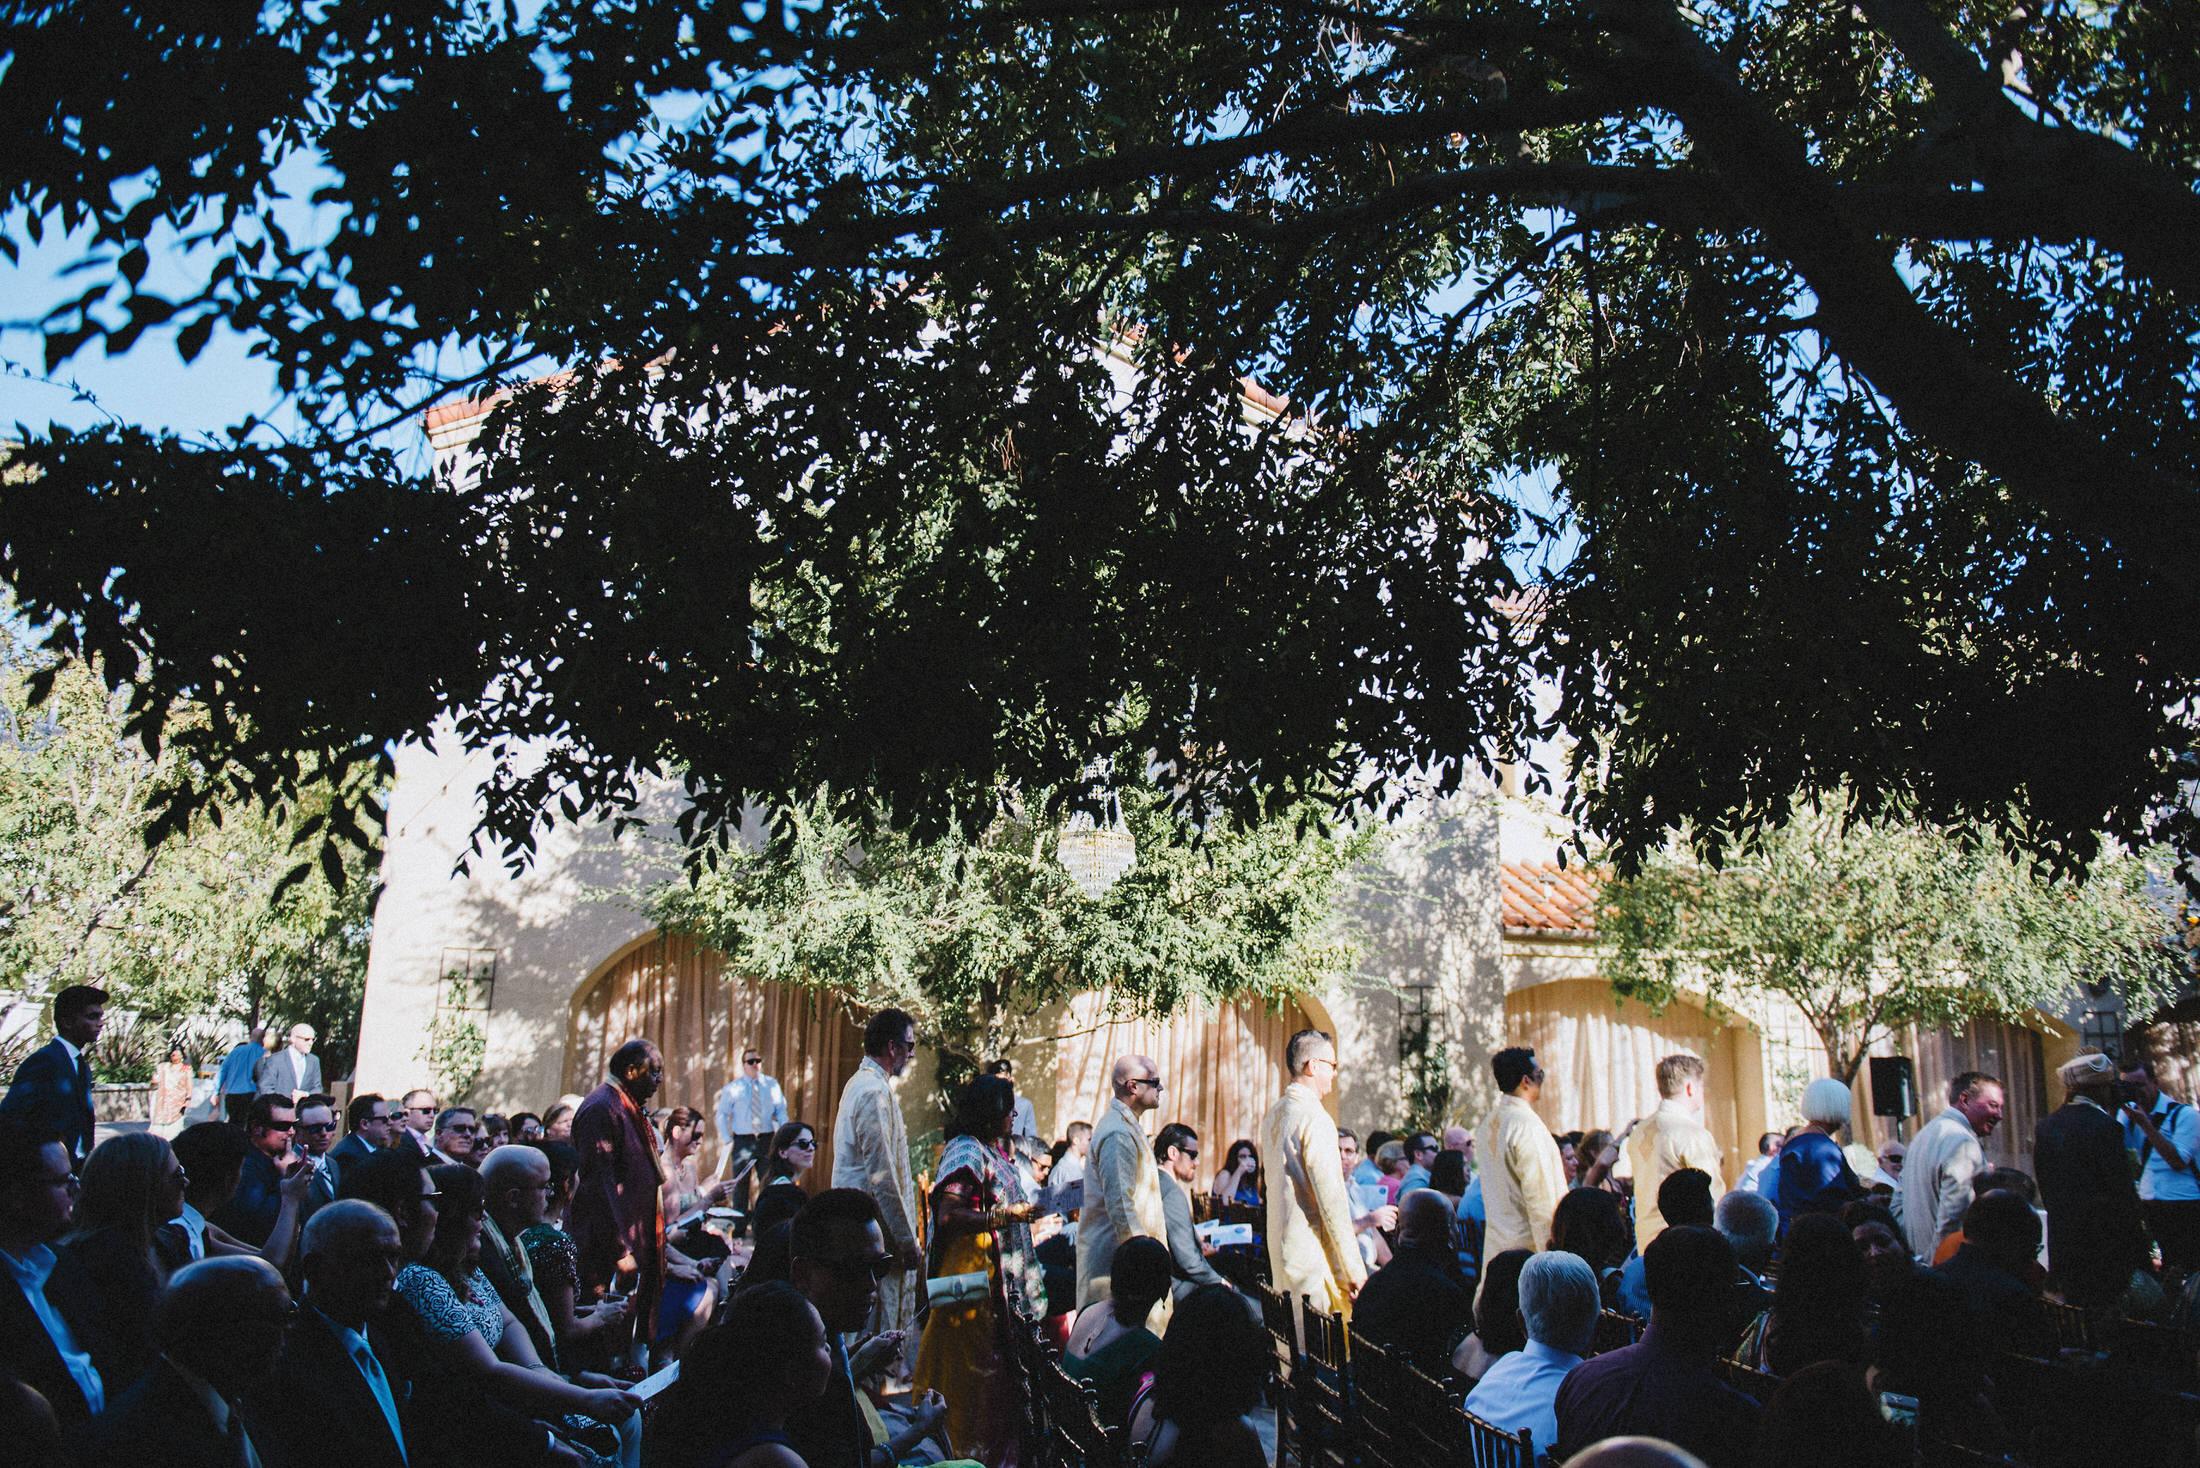 Modern-Indian-Serra-Plaza-wedding-051.jpg